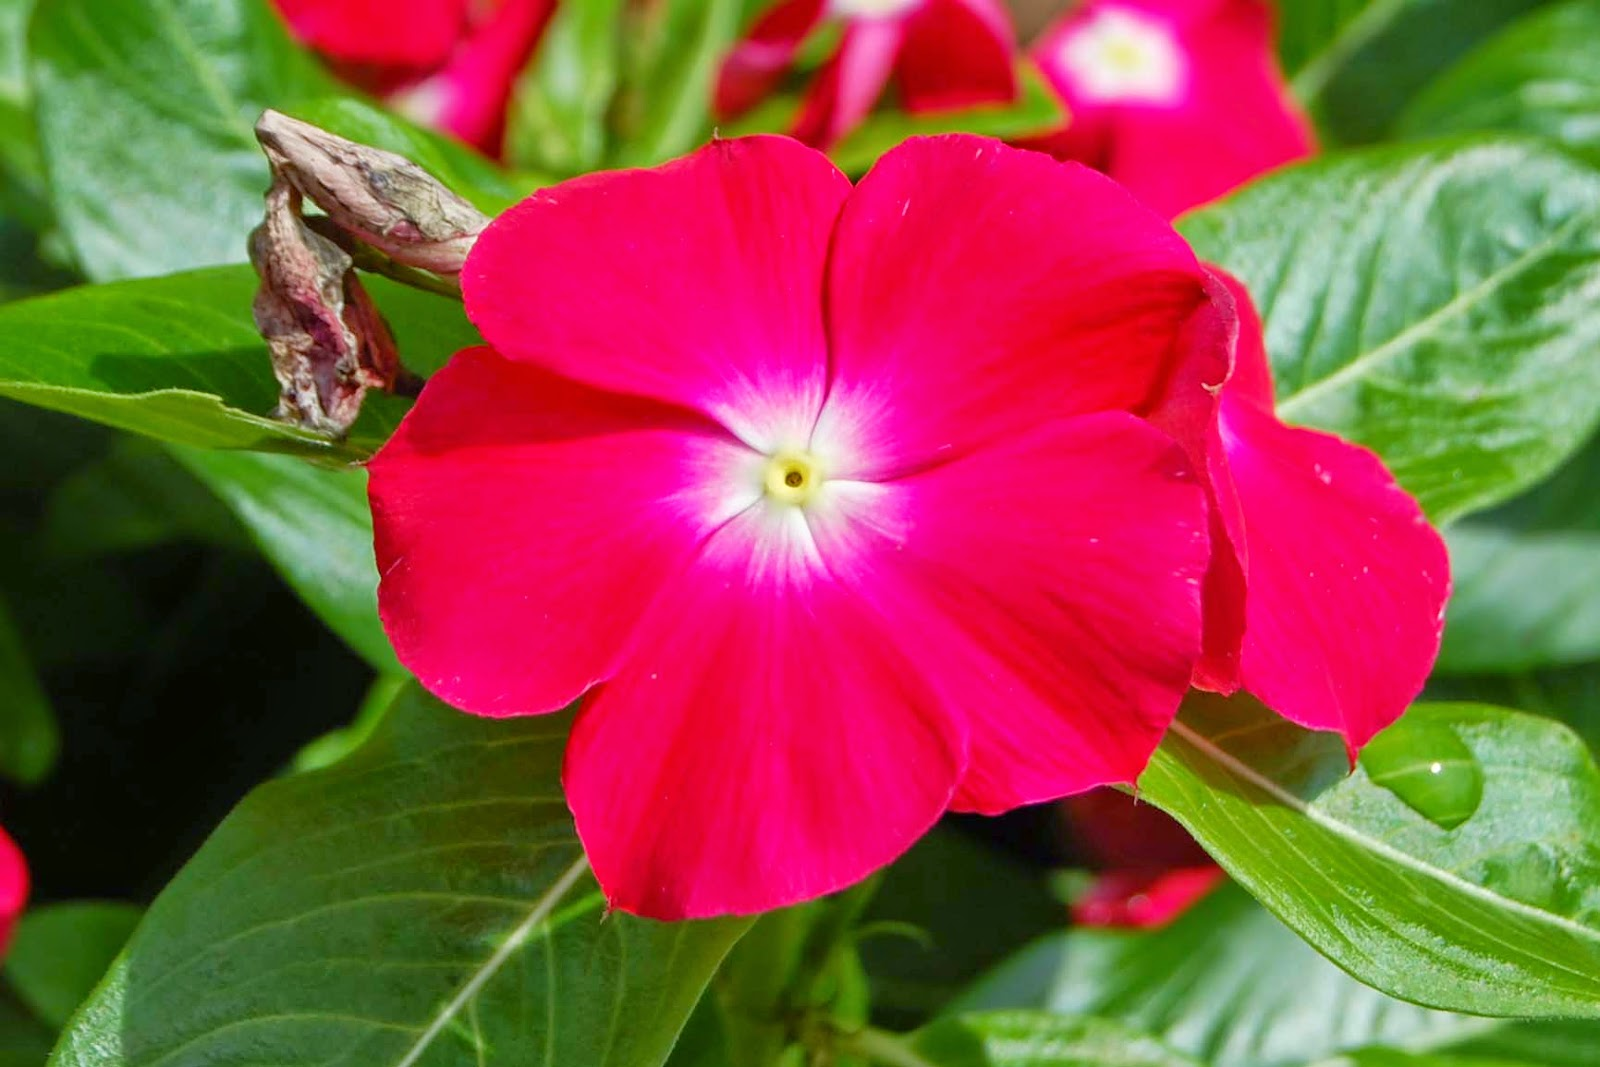 Annual vinca catharanthus roseus rotary botanical gardens jaio scarlet w eye izmirmasajfo